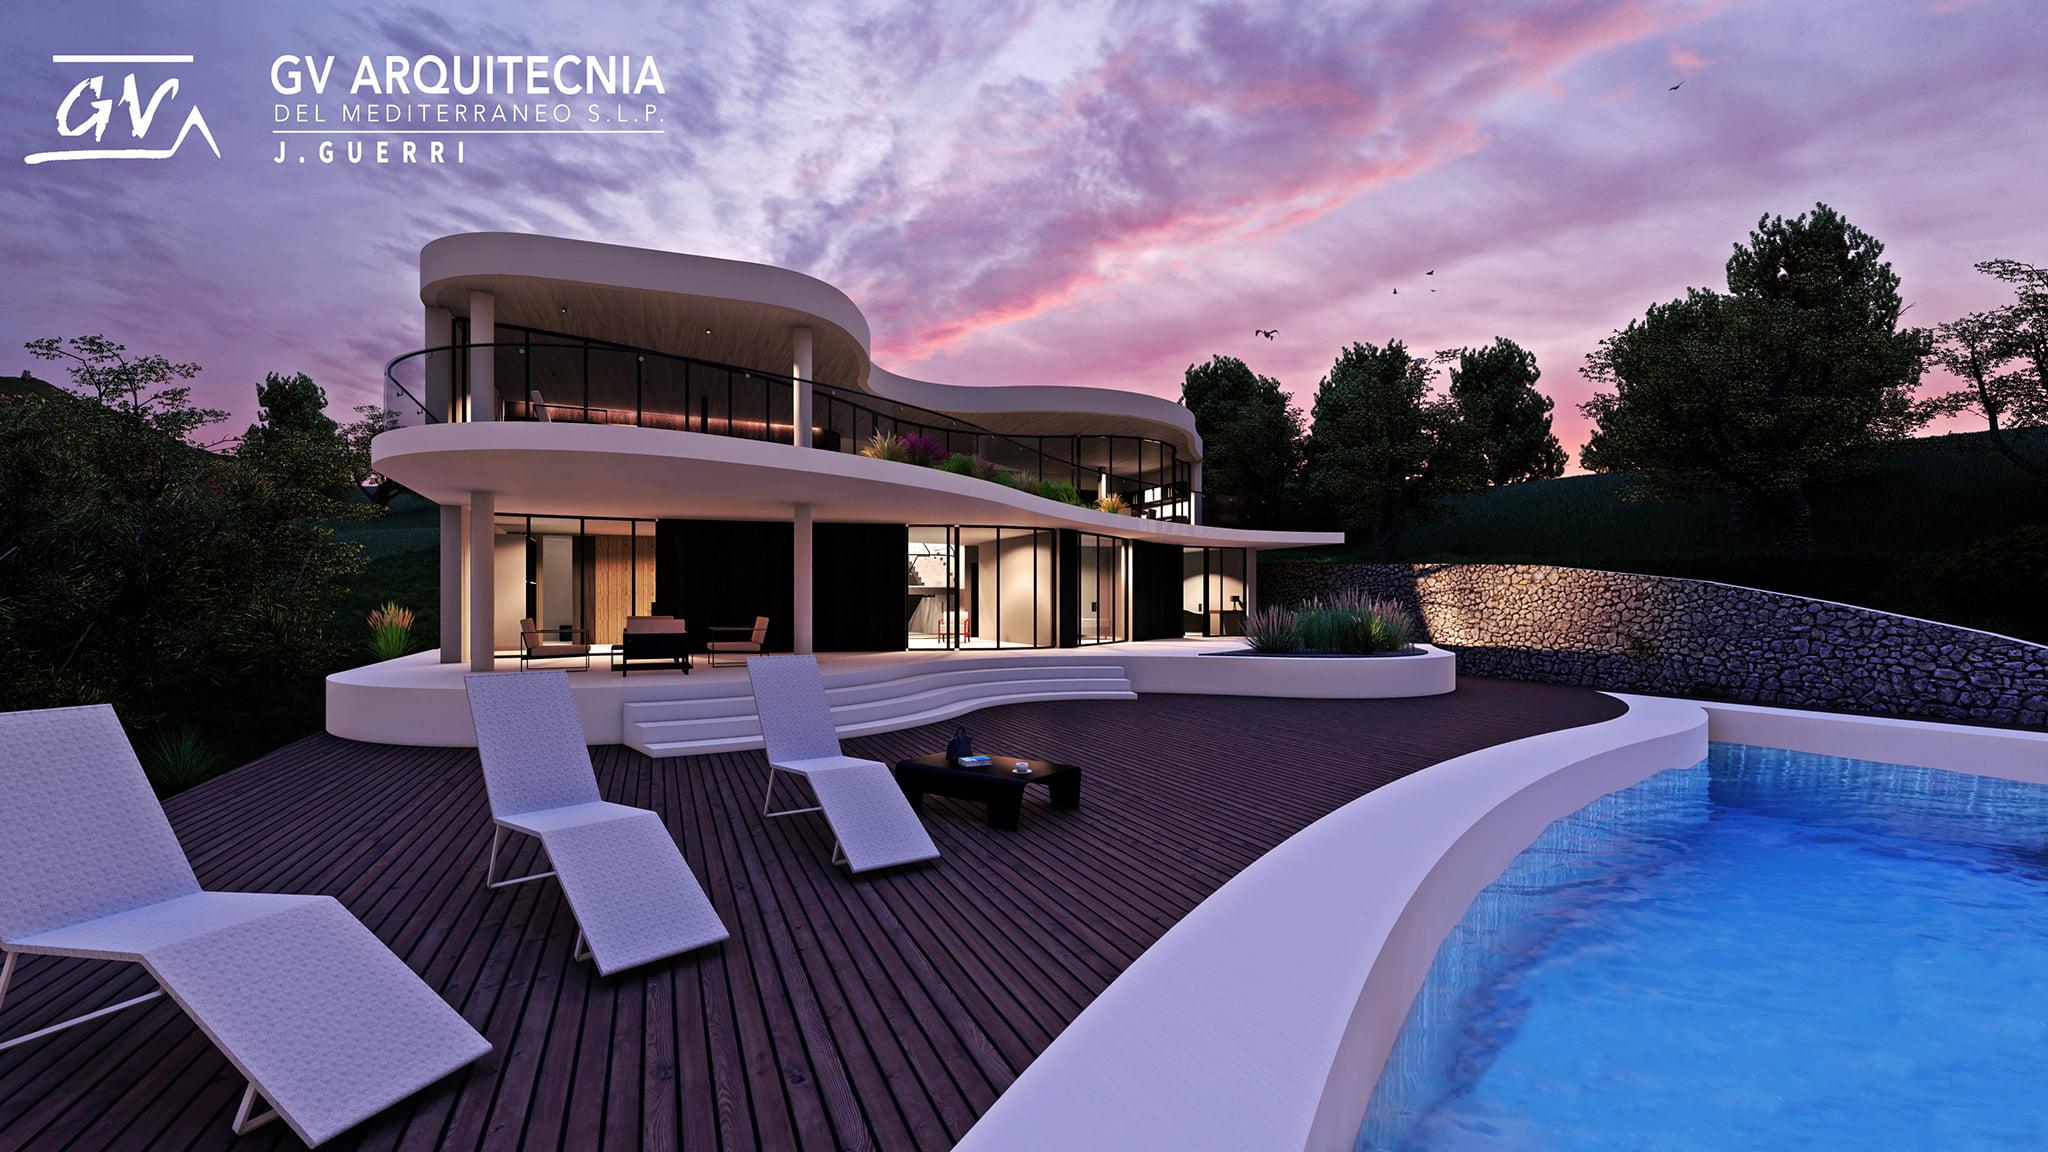 Exterior proyecto  GV Arquitecnia